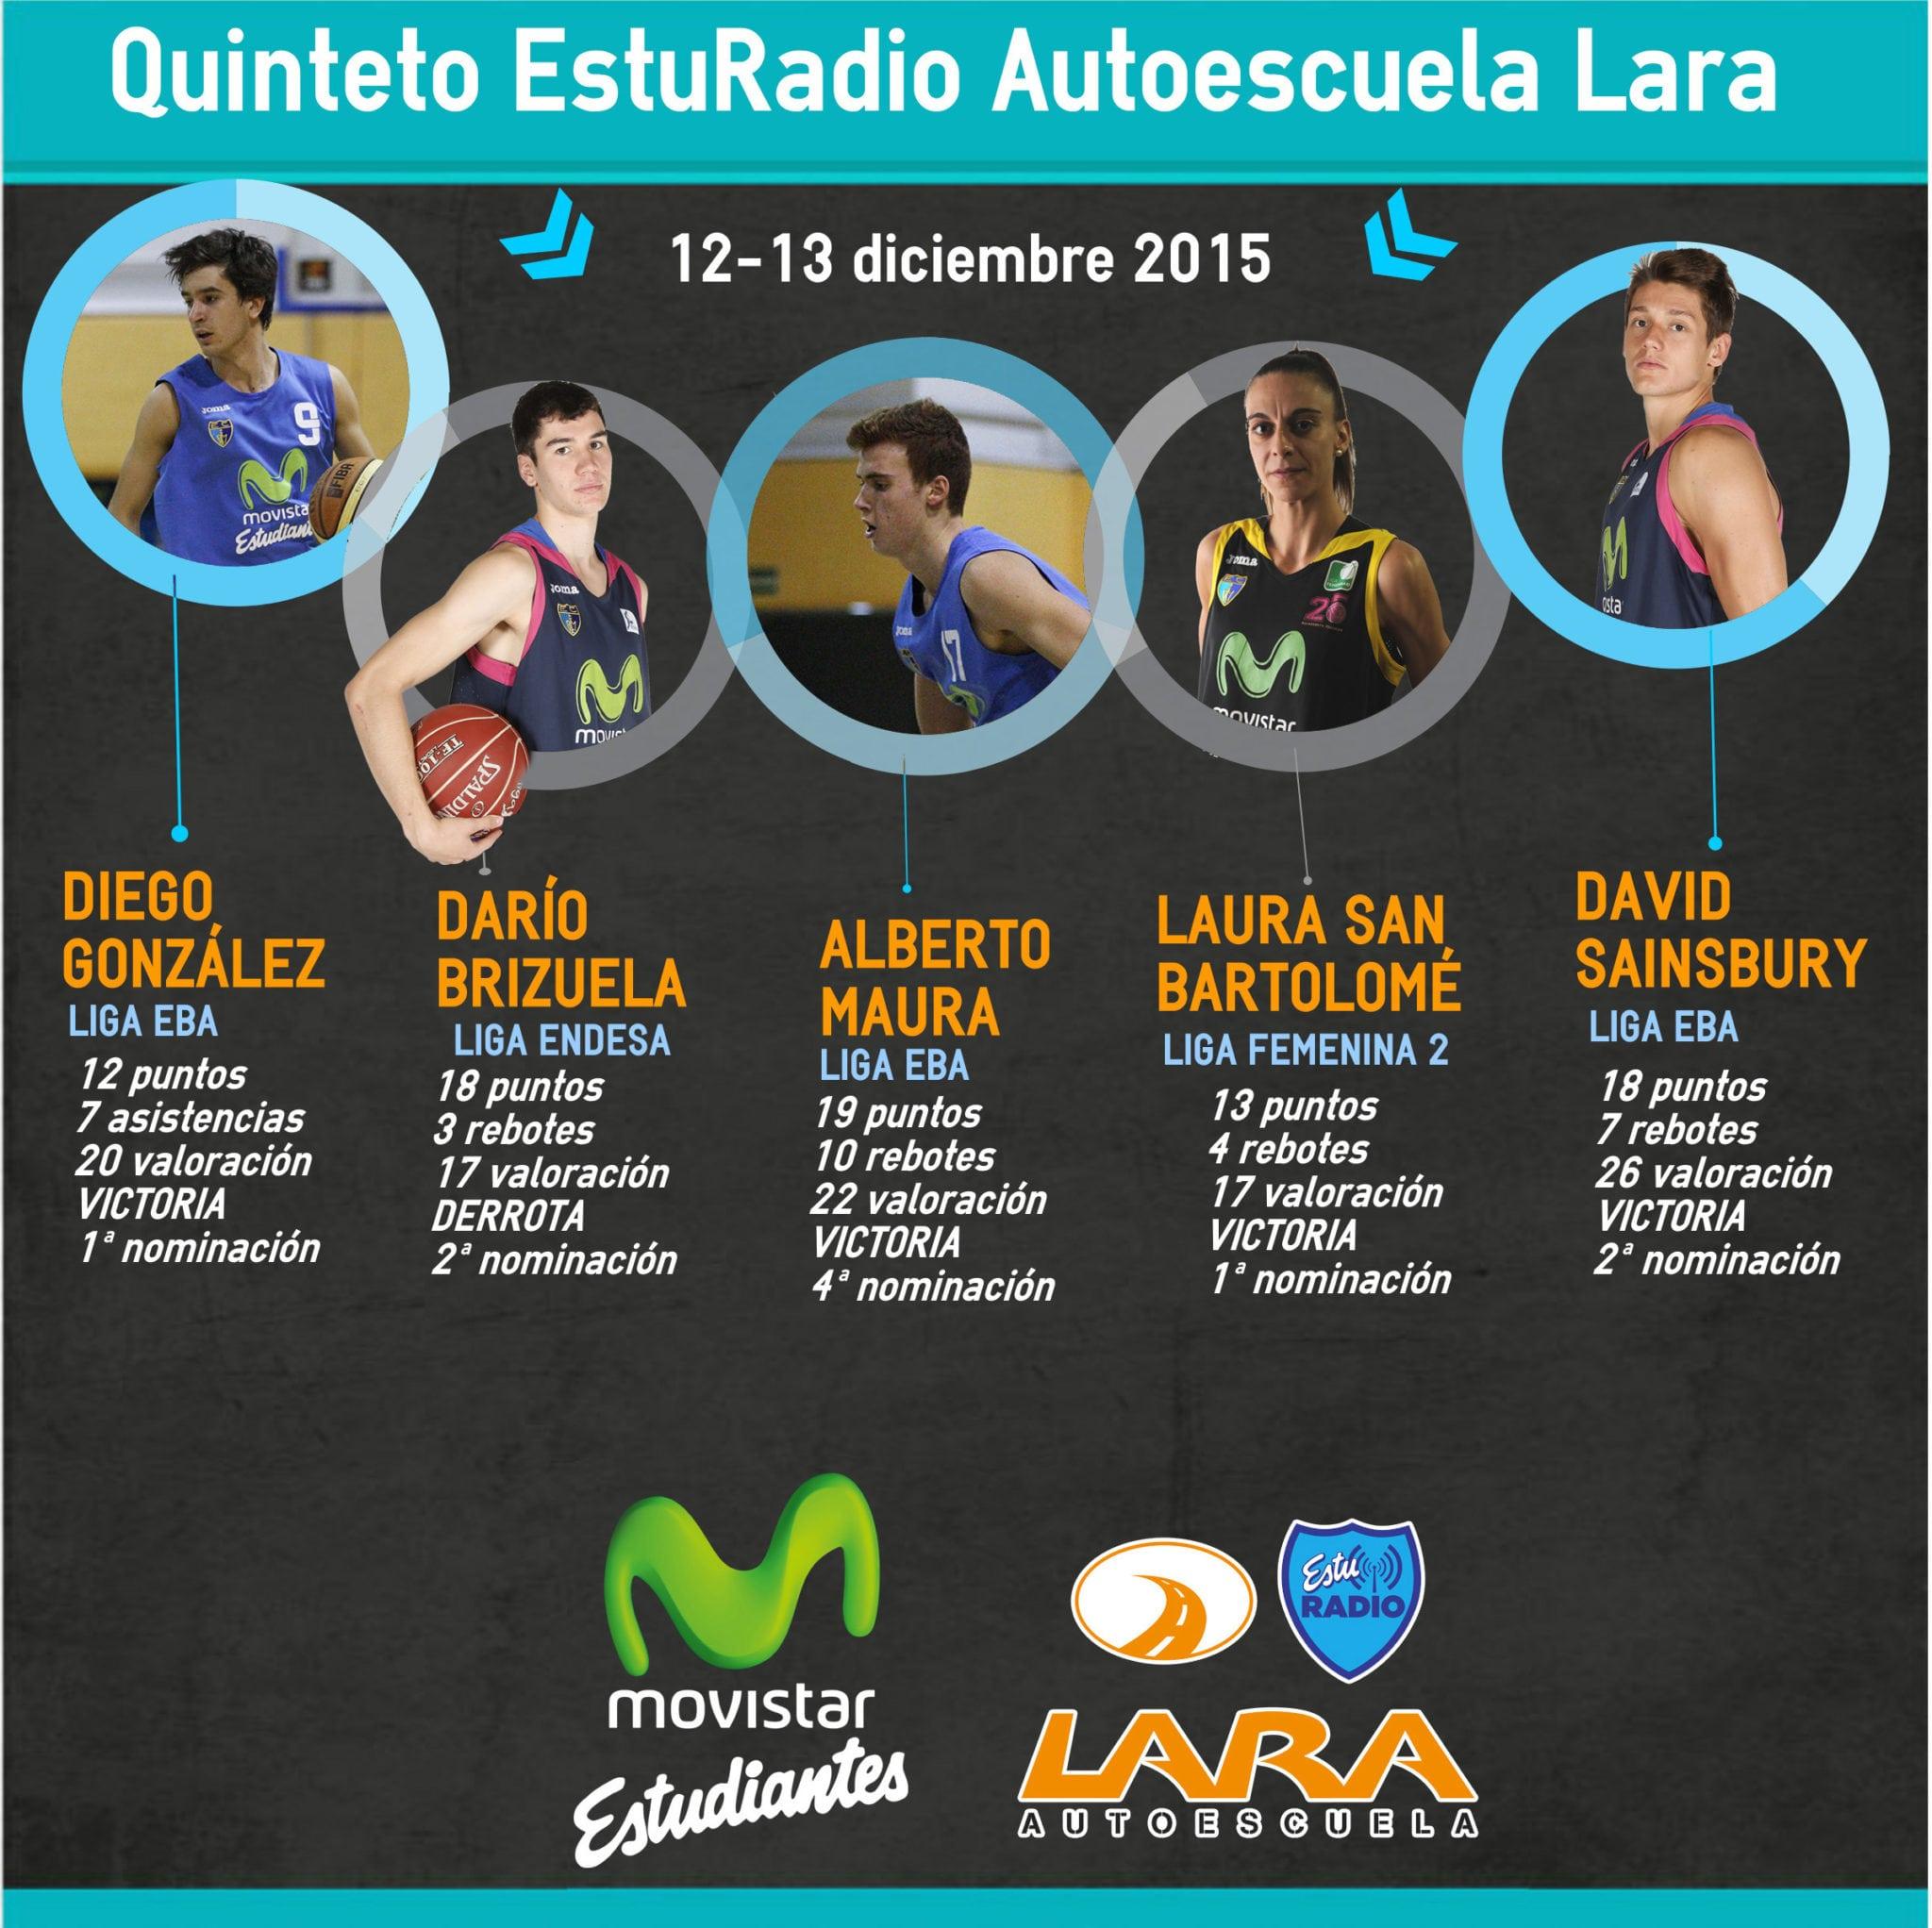 8º Quinteto EstuRadio: D. González, Brizuela, Maura, San Bartolomé y Sainsbury